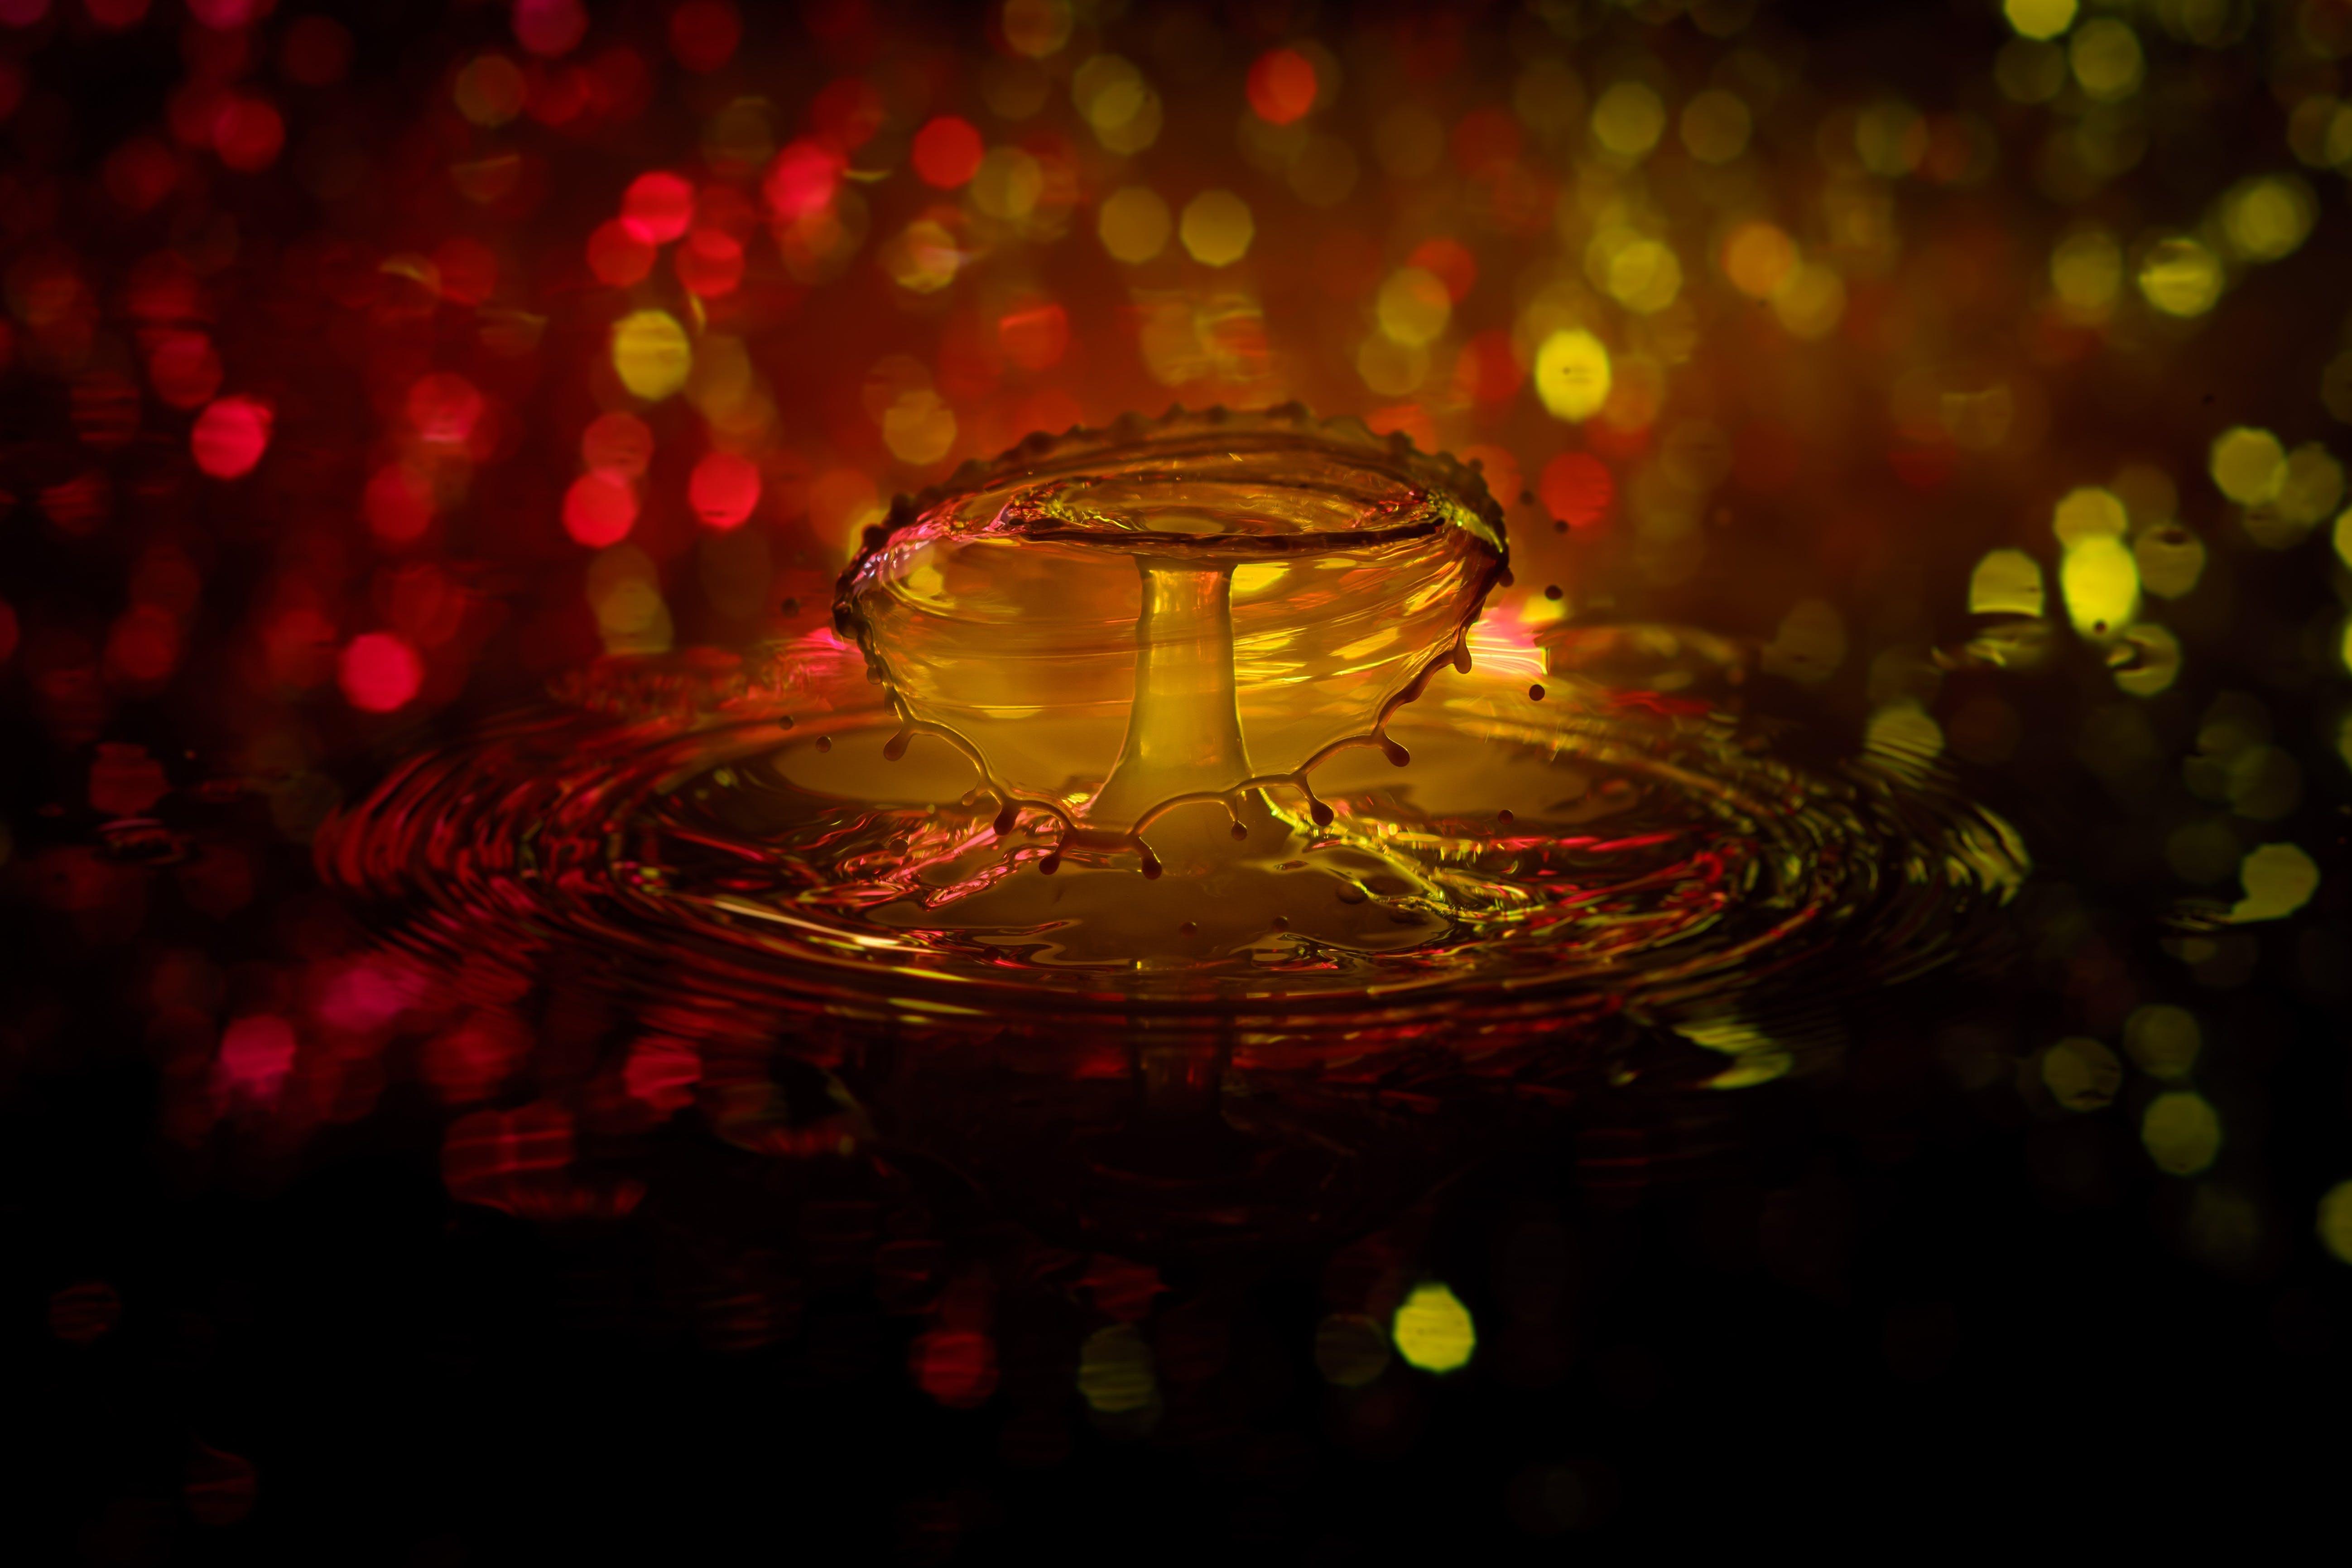 Free stock photo of water, drop of water, spray, liquid